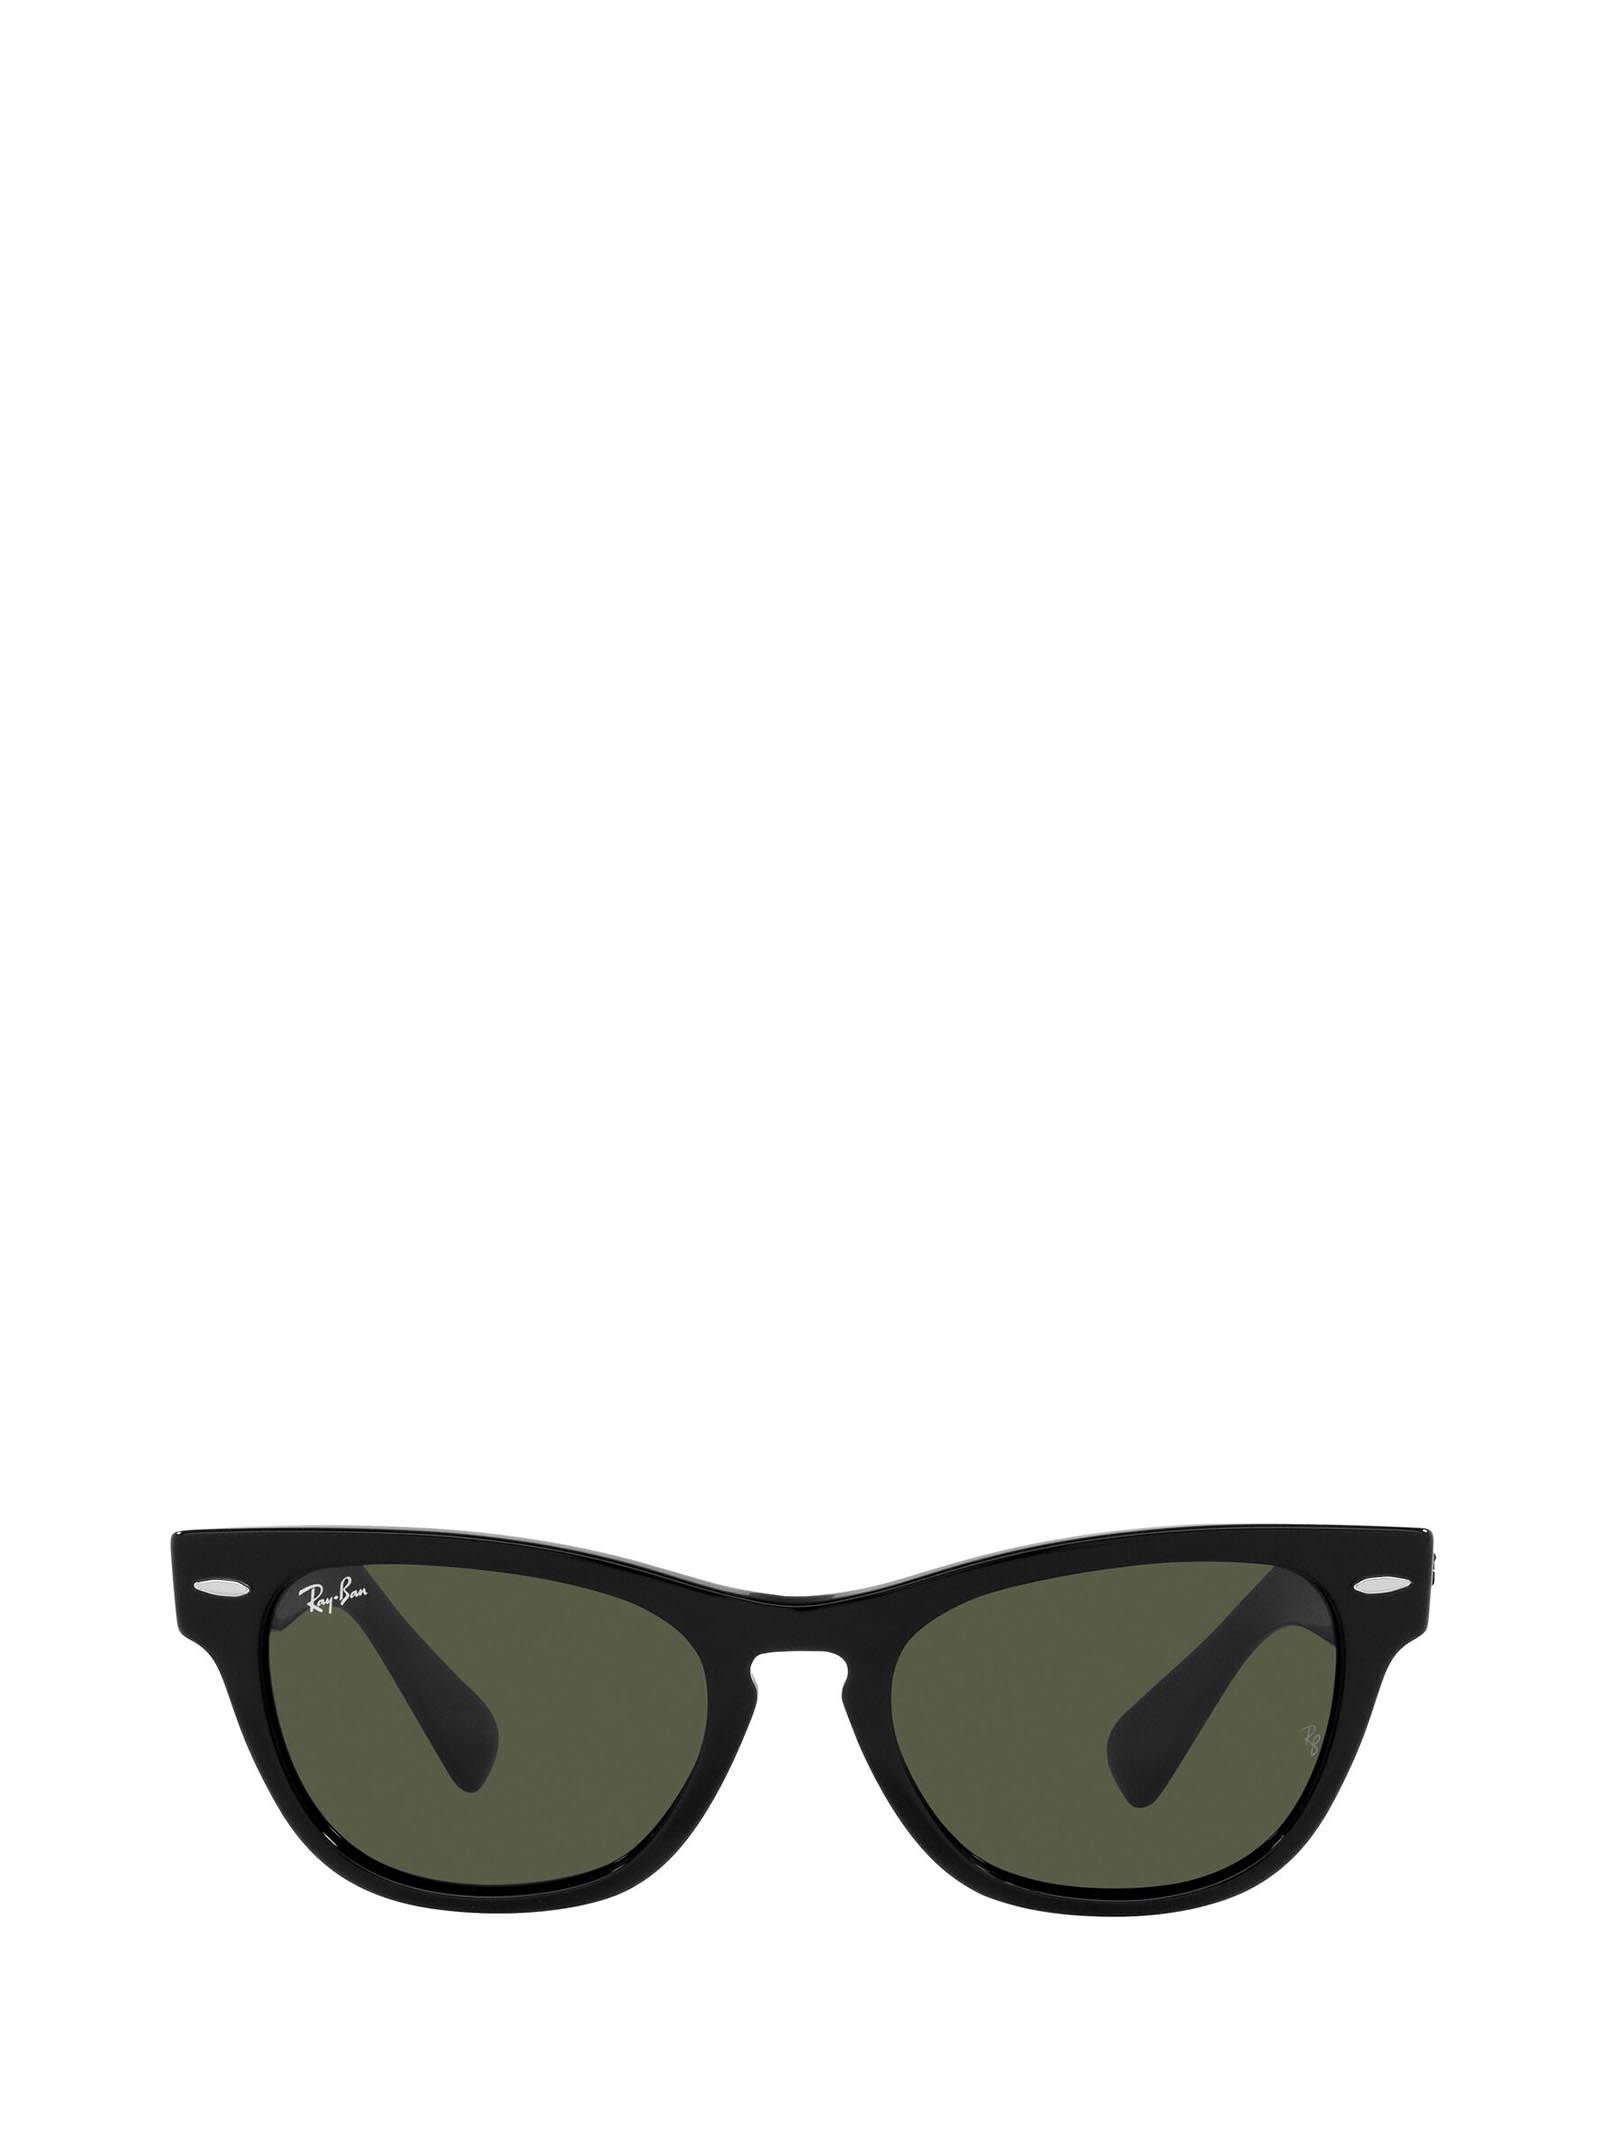 Ray-Ban Ray-ban Rb2201 Black Sunglasses